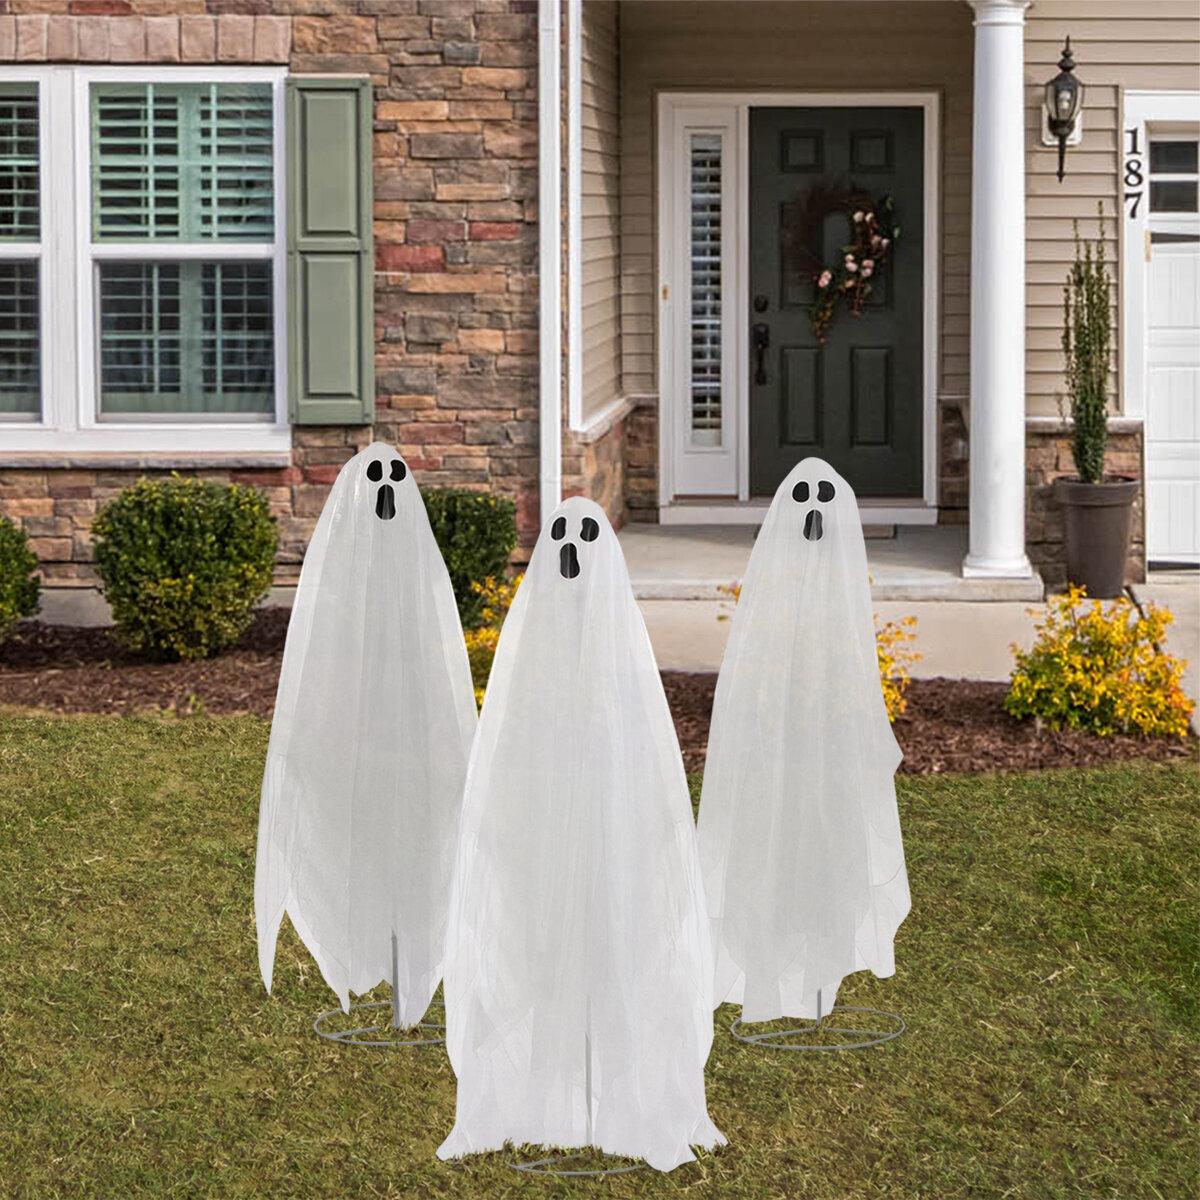 The Holiday Aisle Ghost Trio Lawn Art Reviews Wayfair